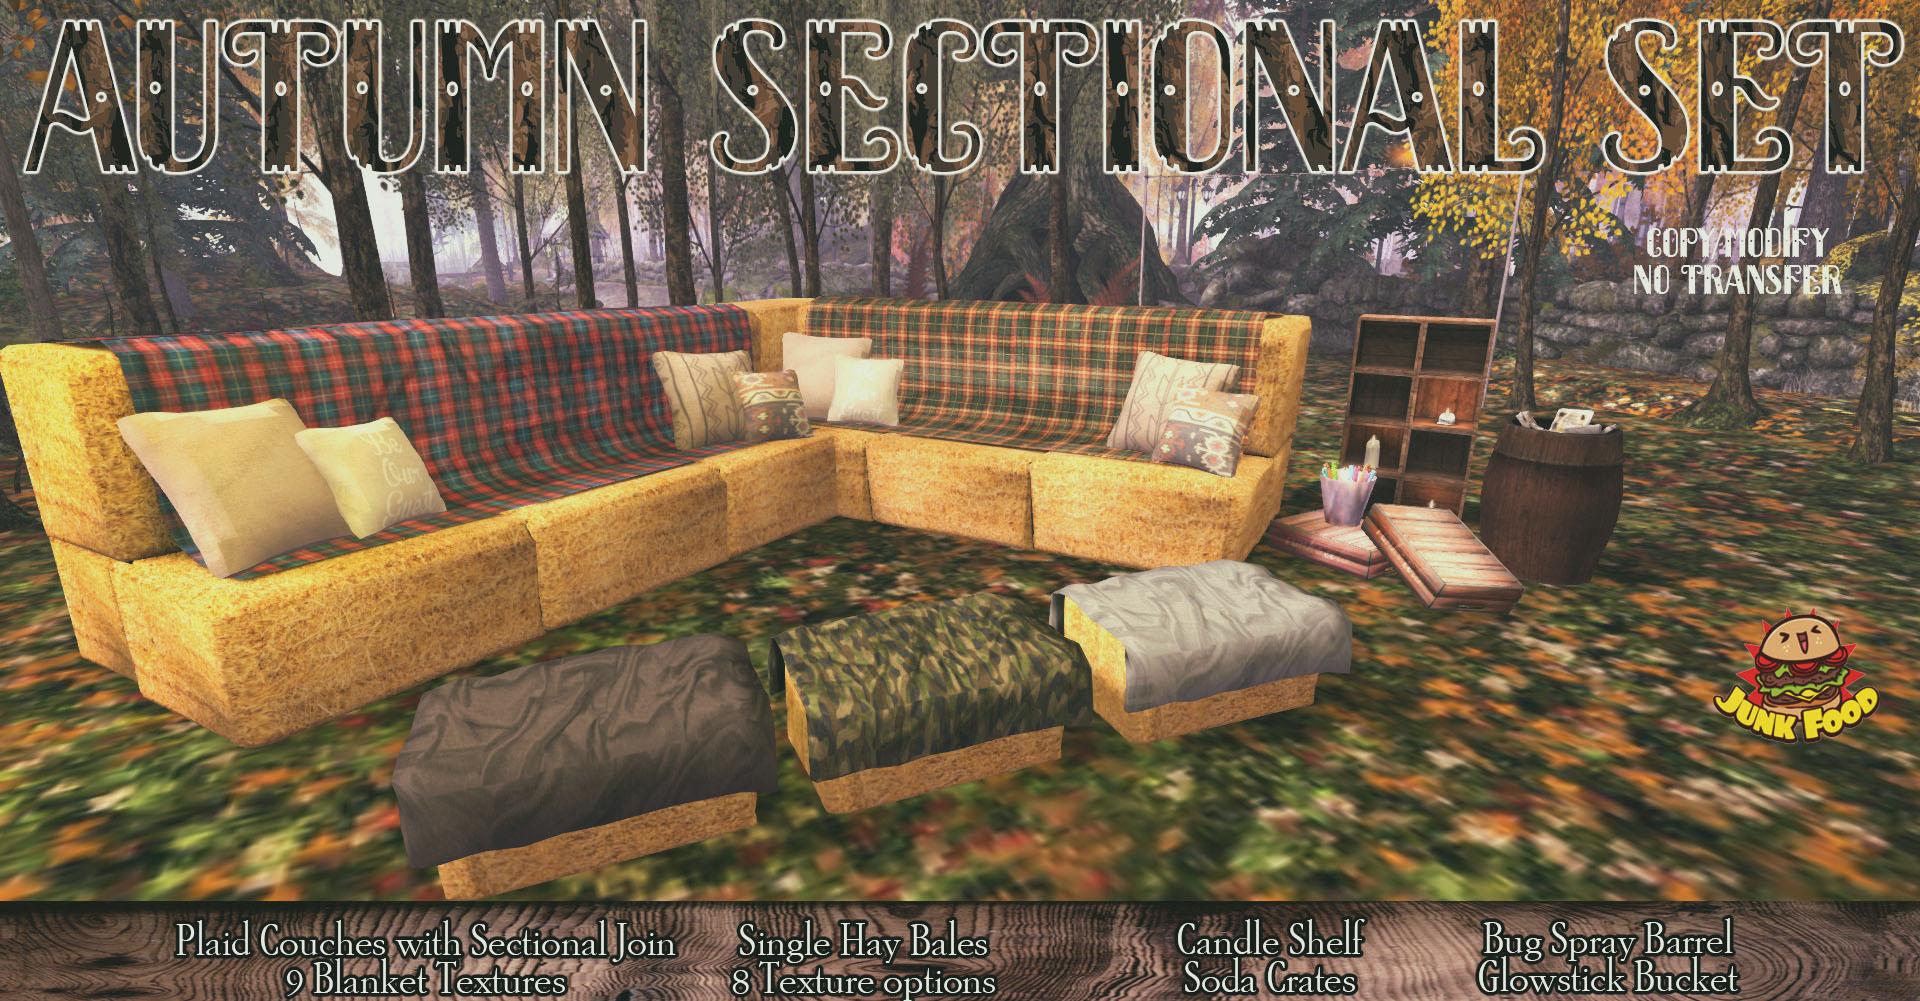 Junk Food - Autumn Sectional Set.jpg